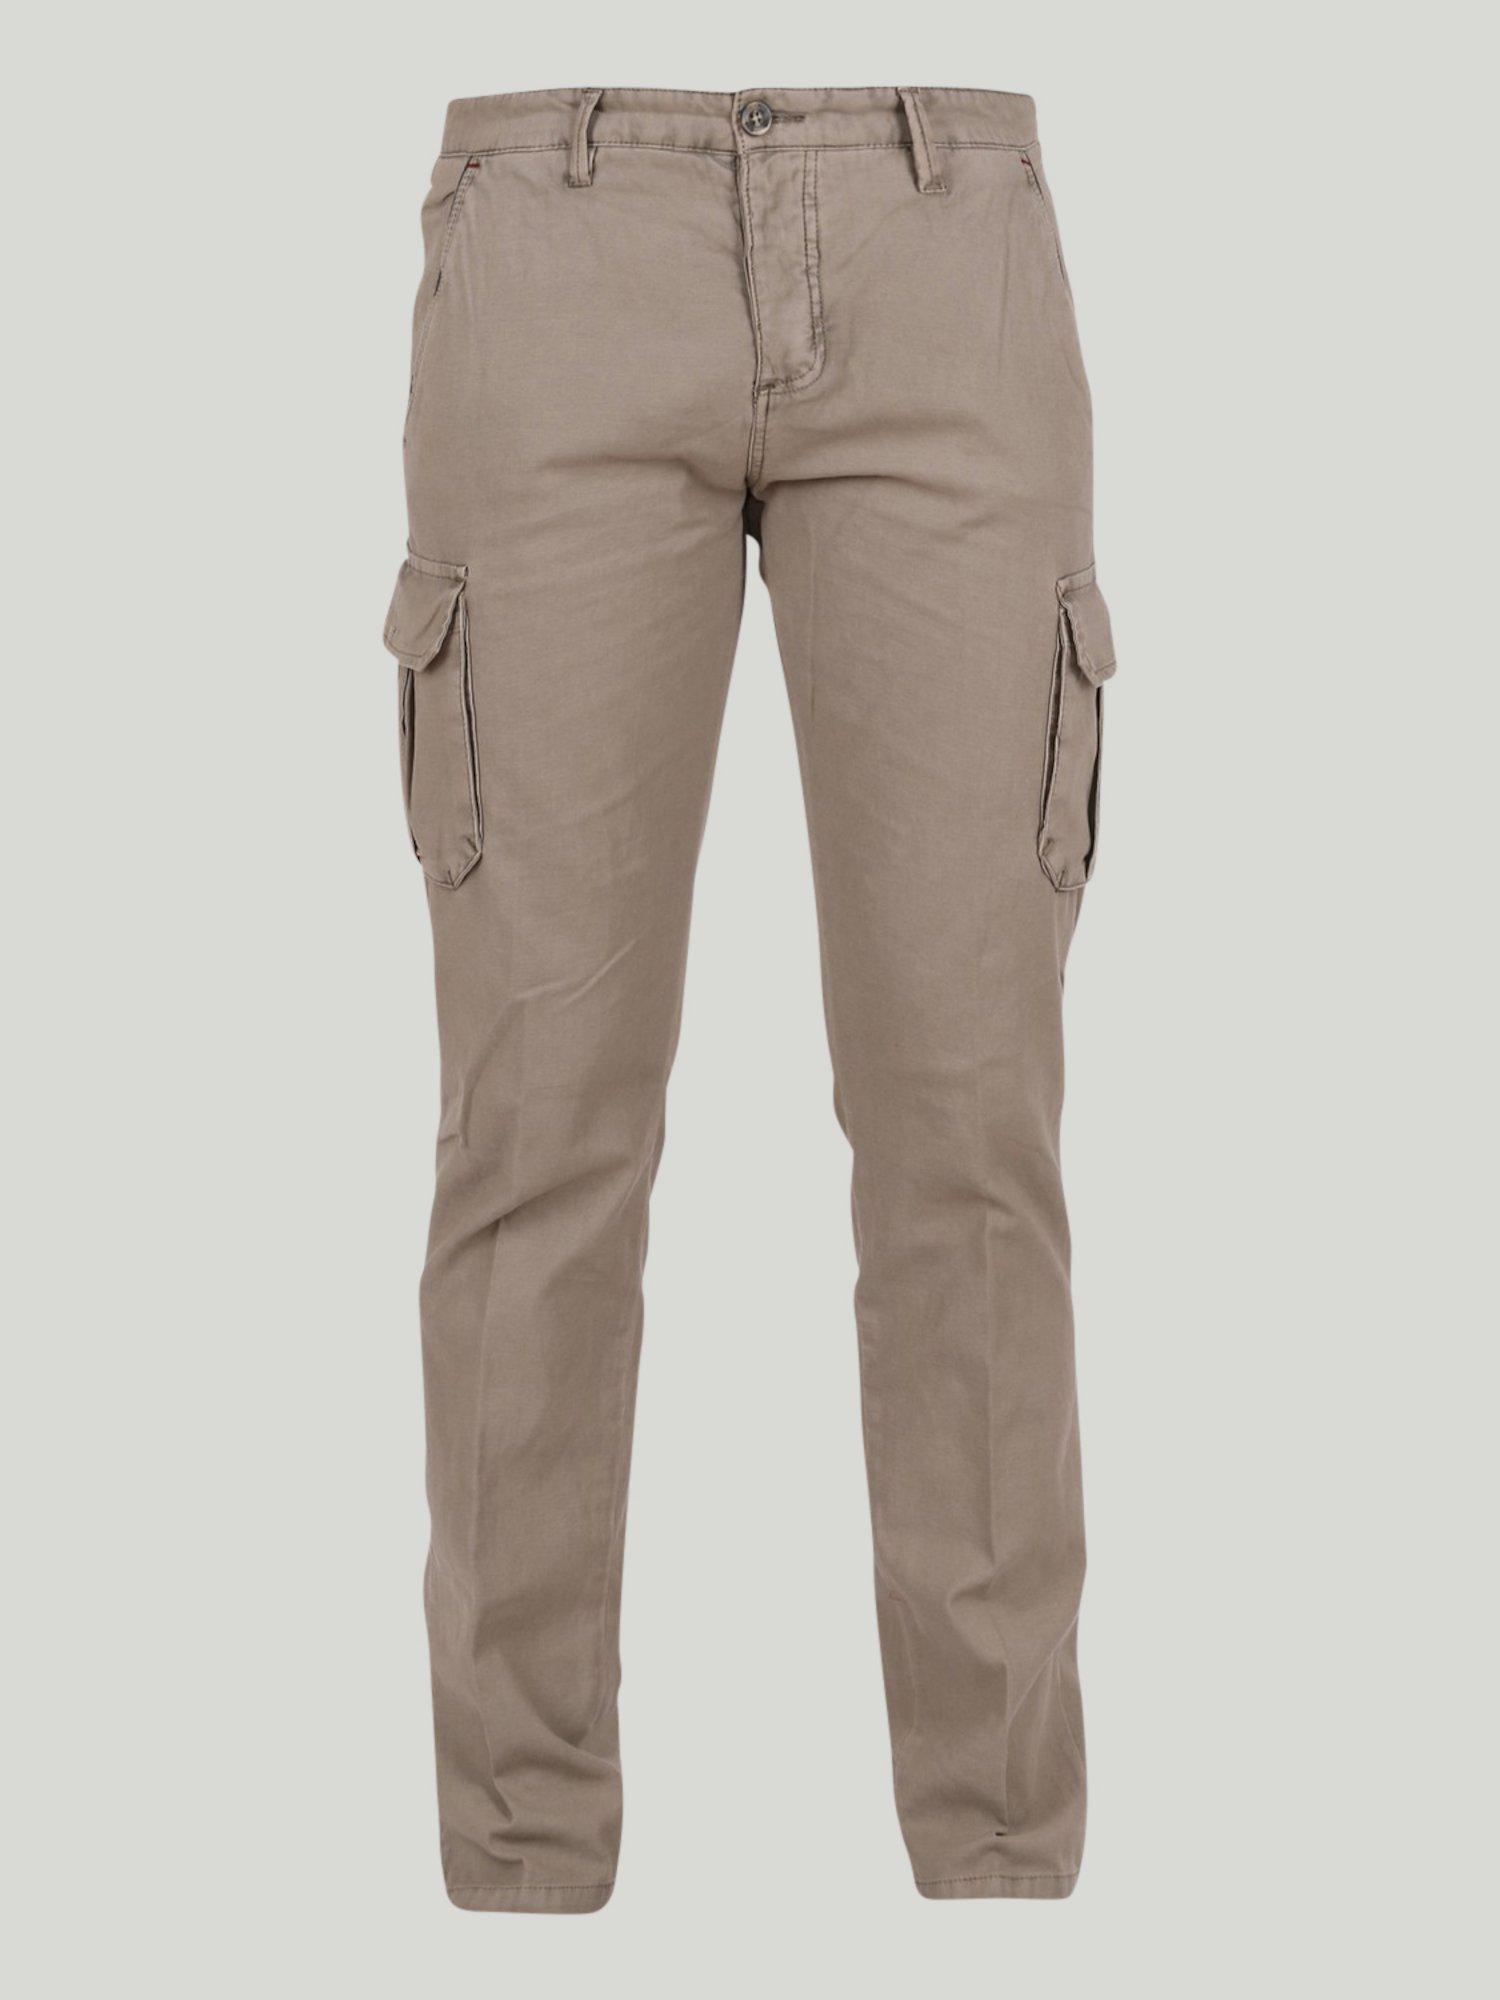 Newjersey pants - Army